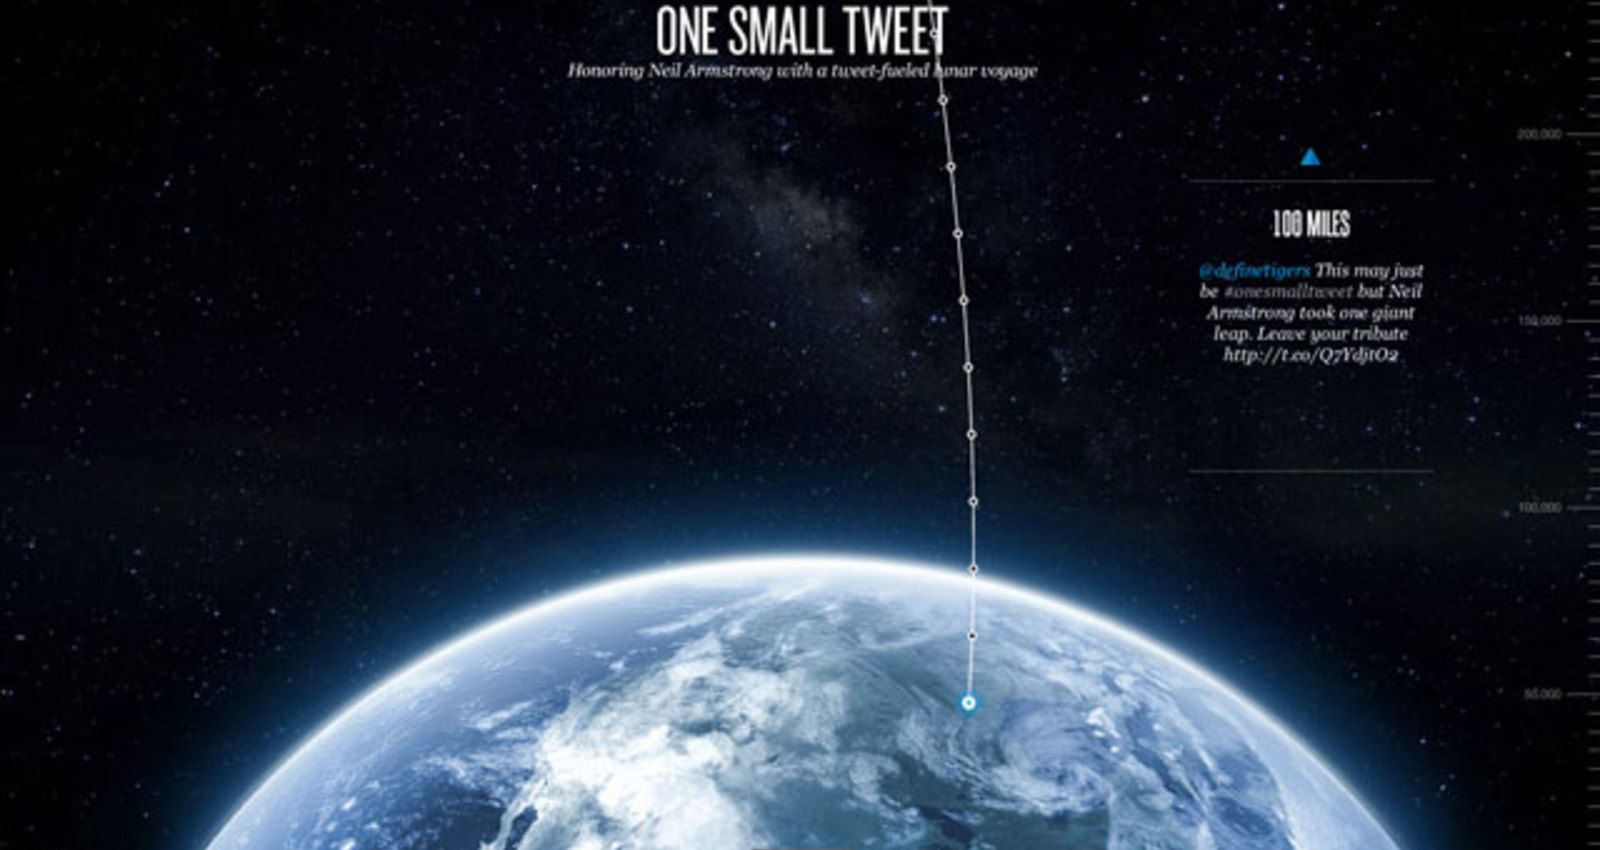 One Small Tweet